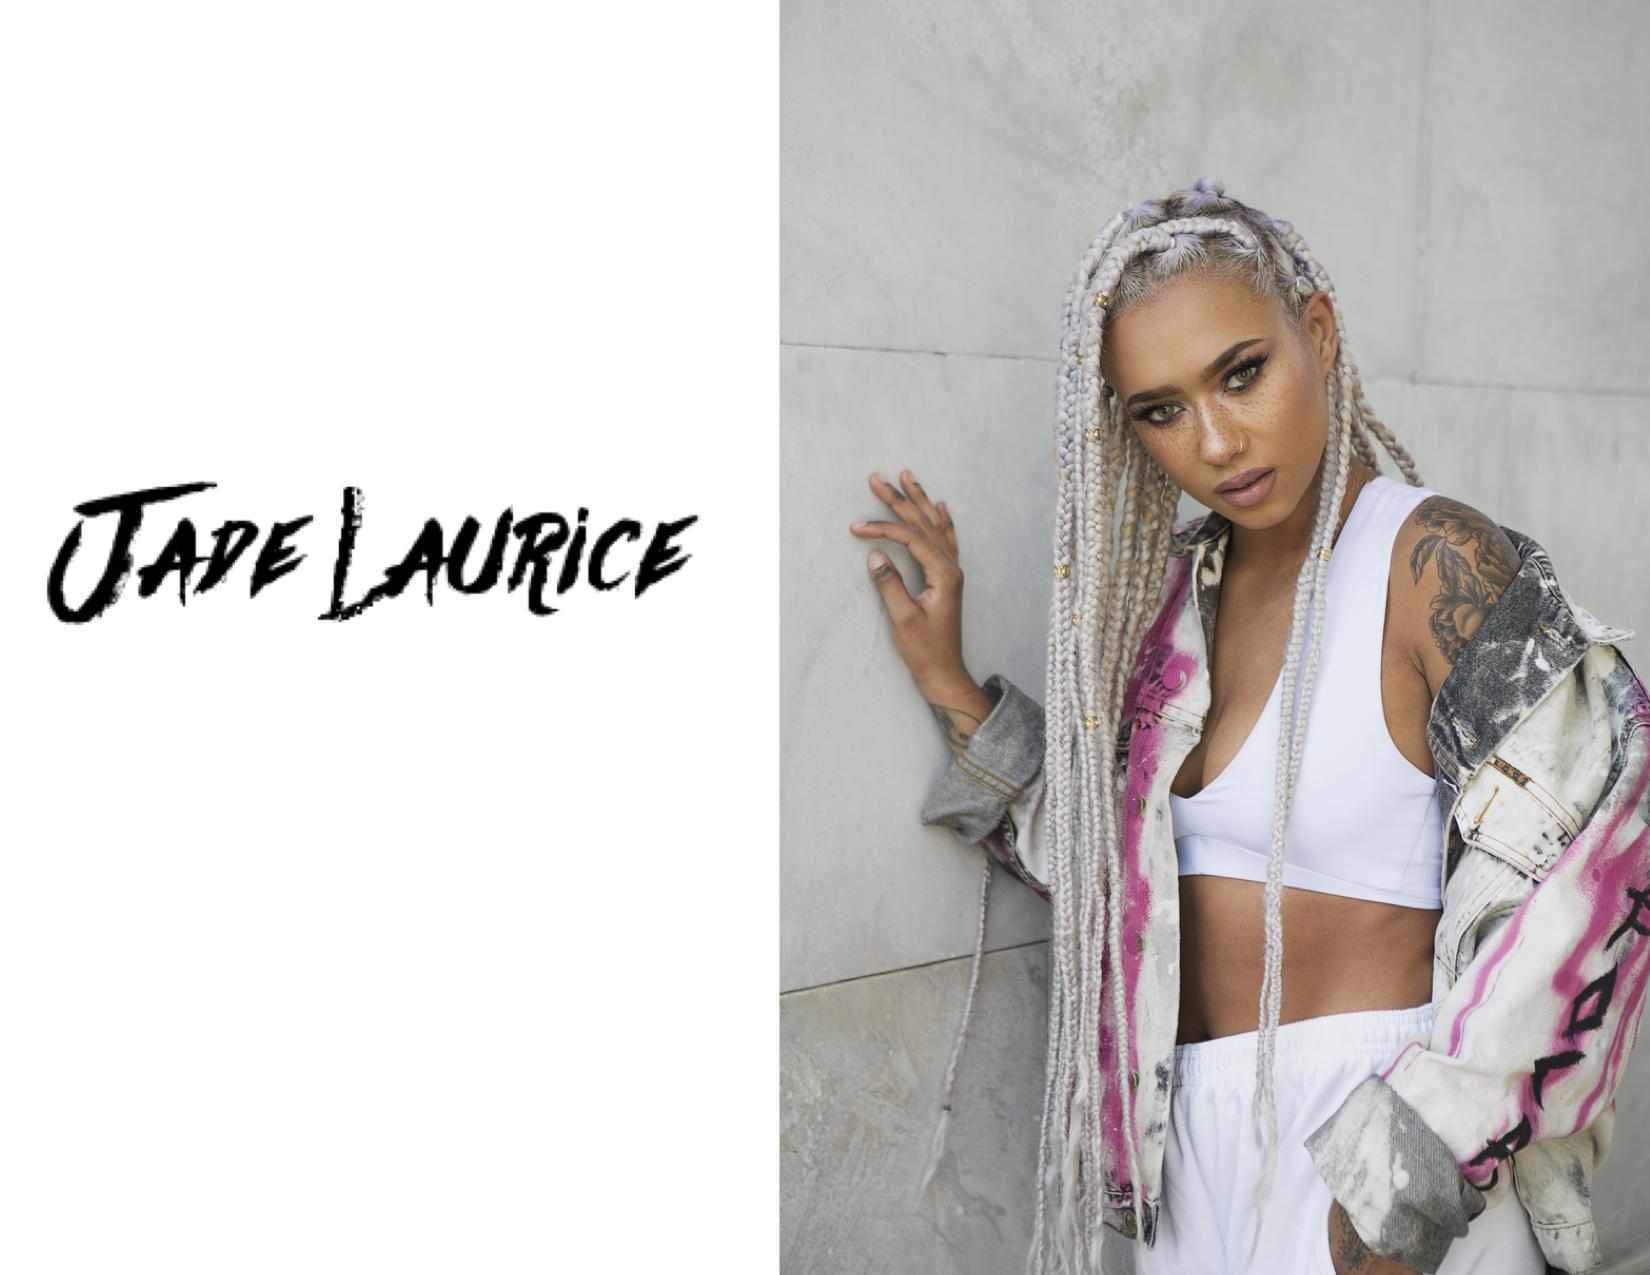 jade laurice media kit 2018.jpg